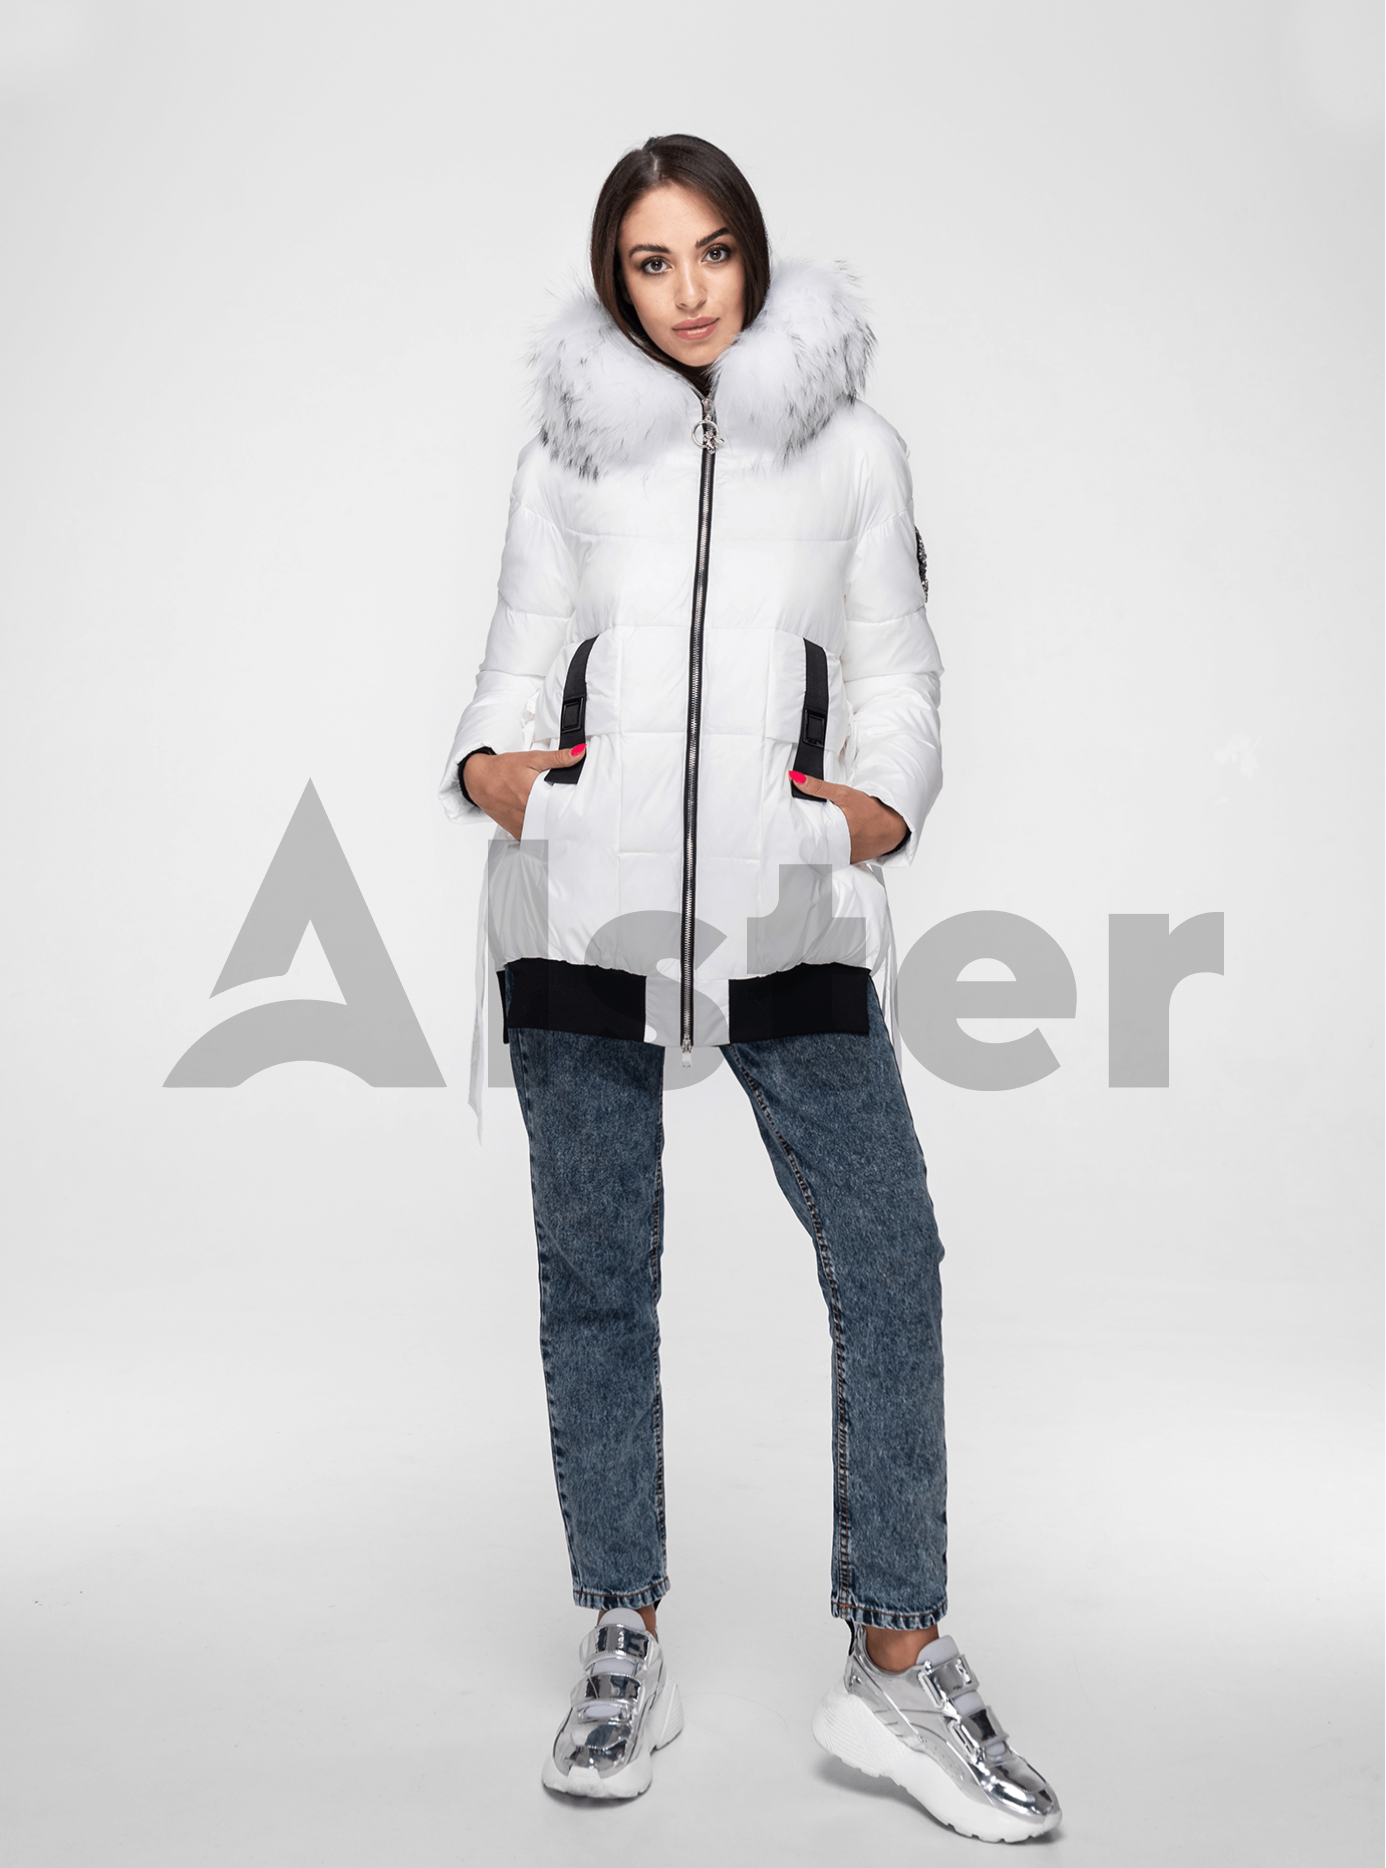 Куртка зимняя с завязками и мехом енота Белый L (02-V191114): фото - Alster.ua